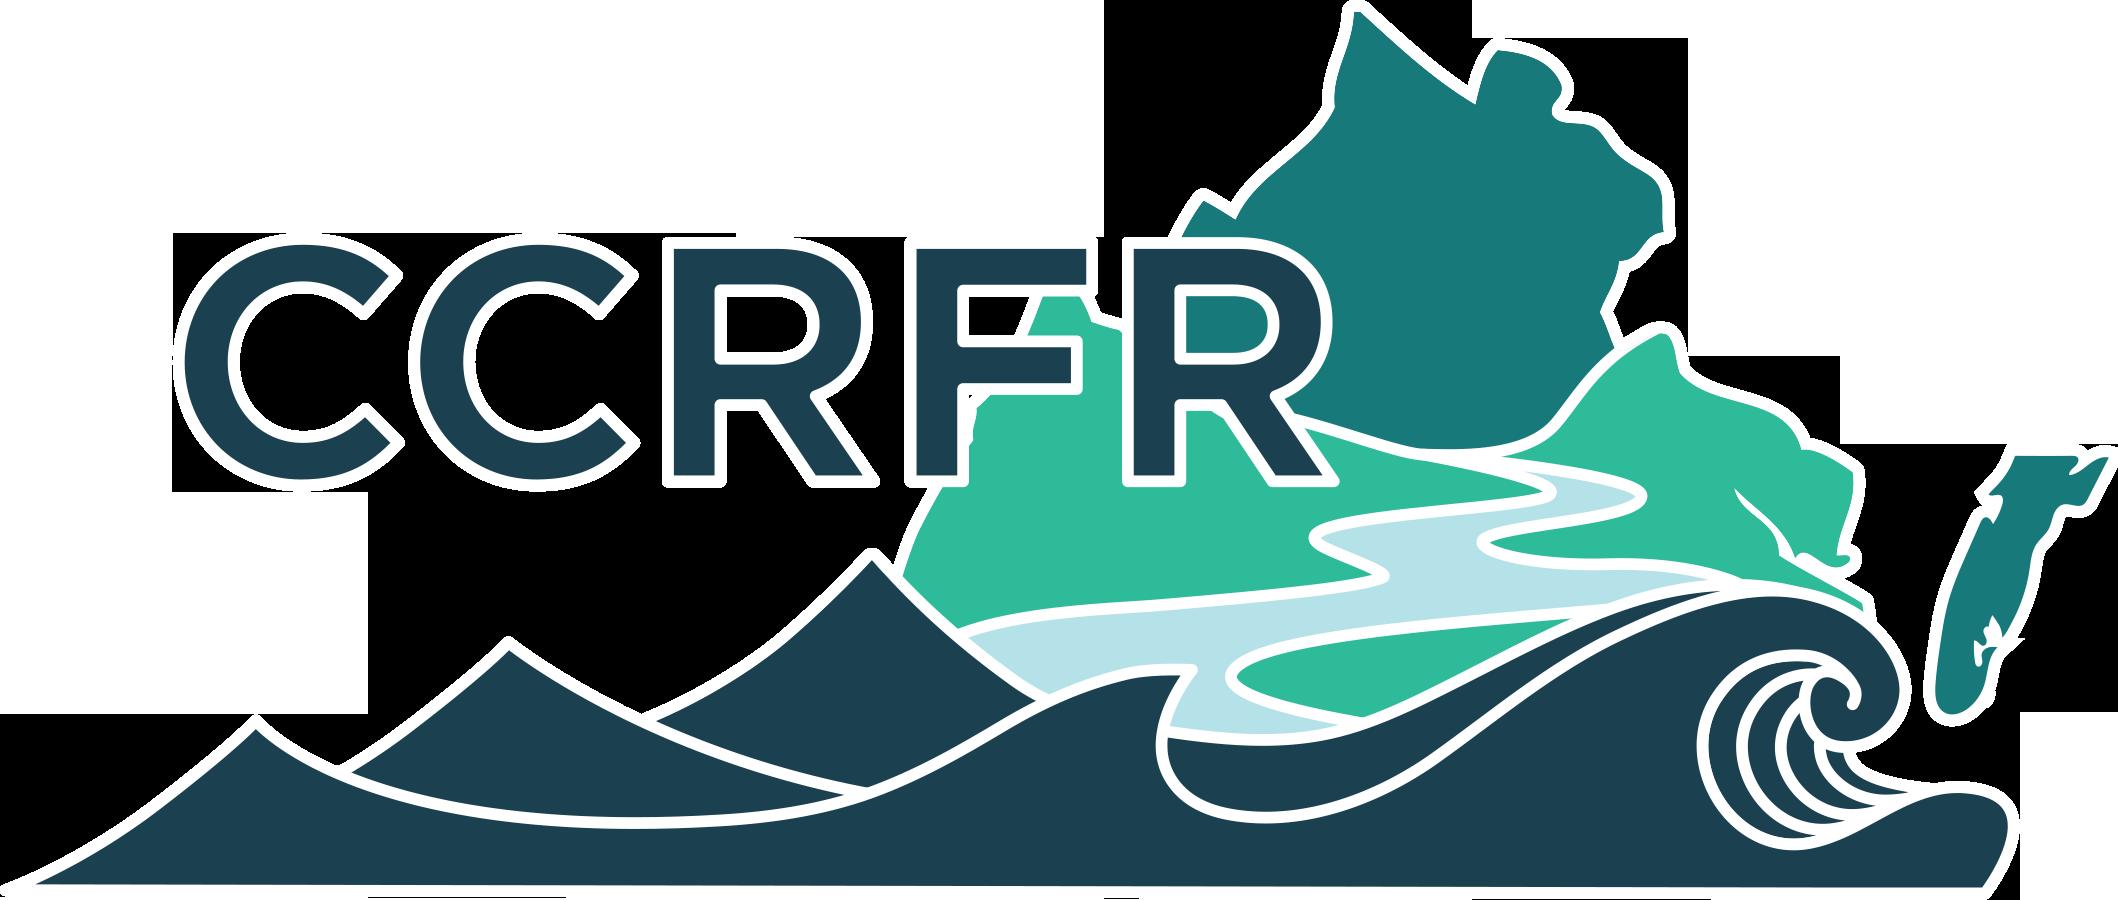 CCRFR logo